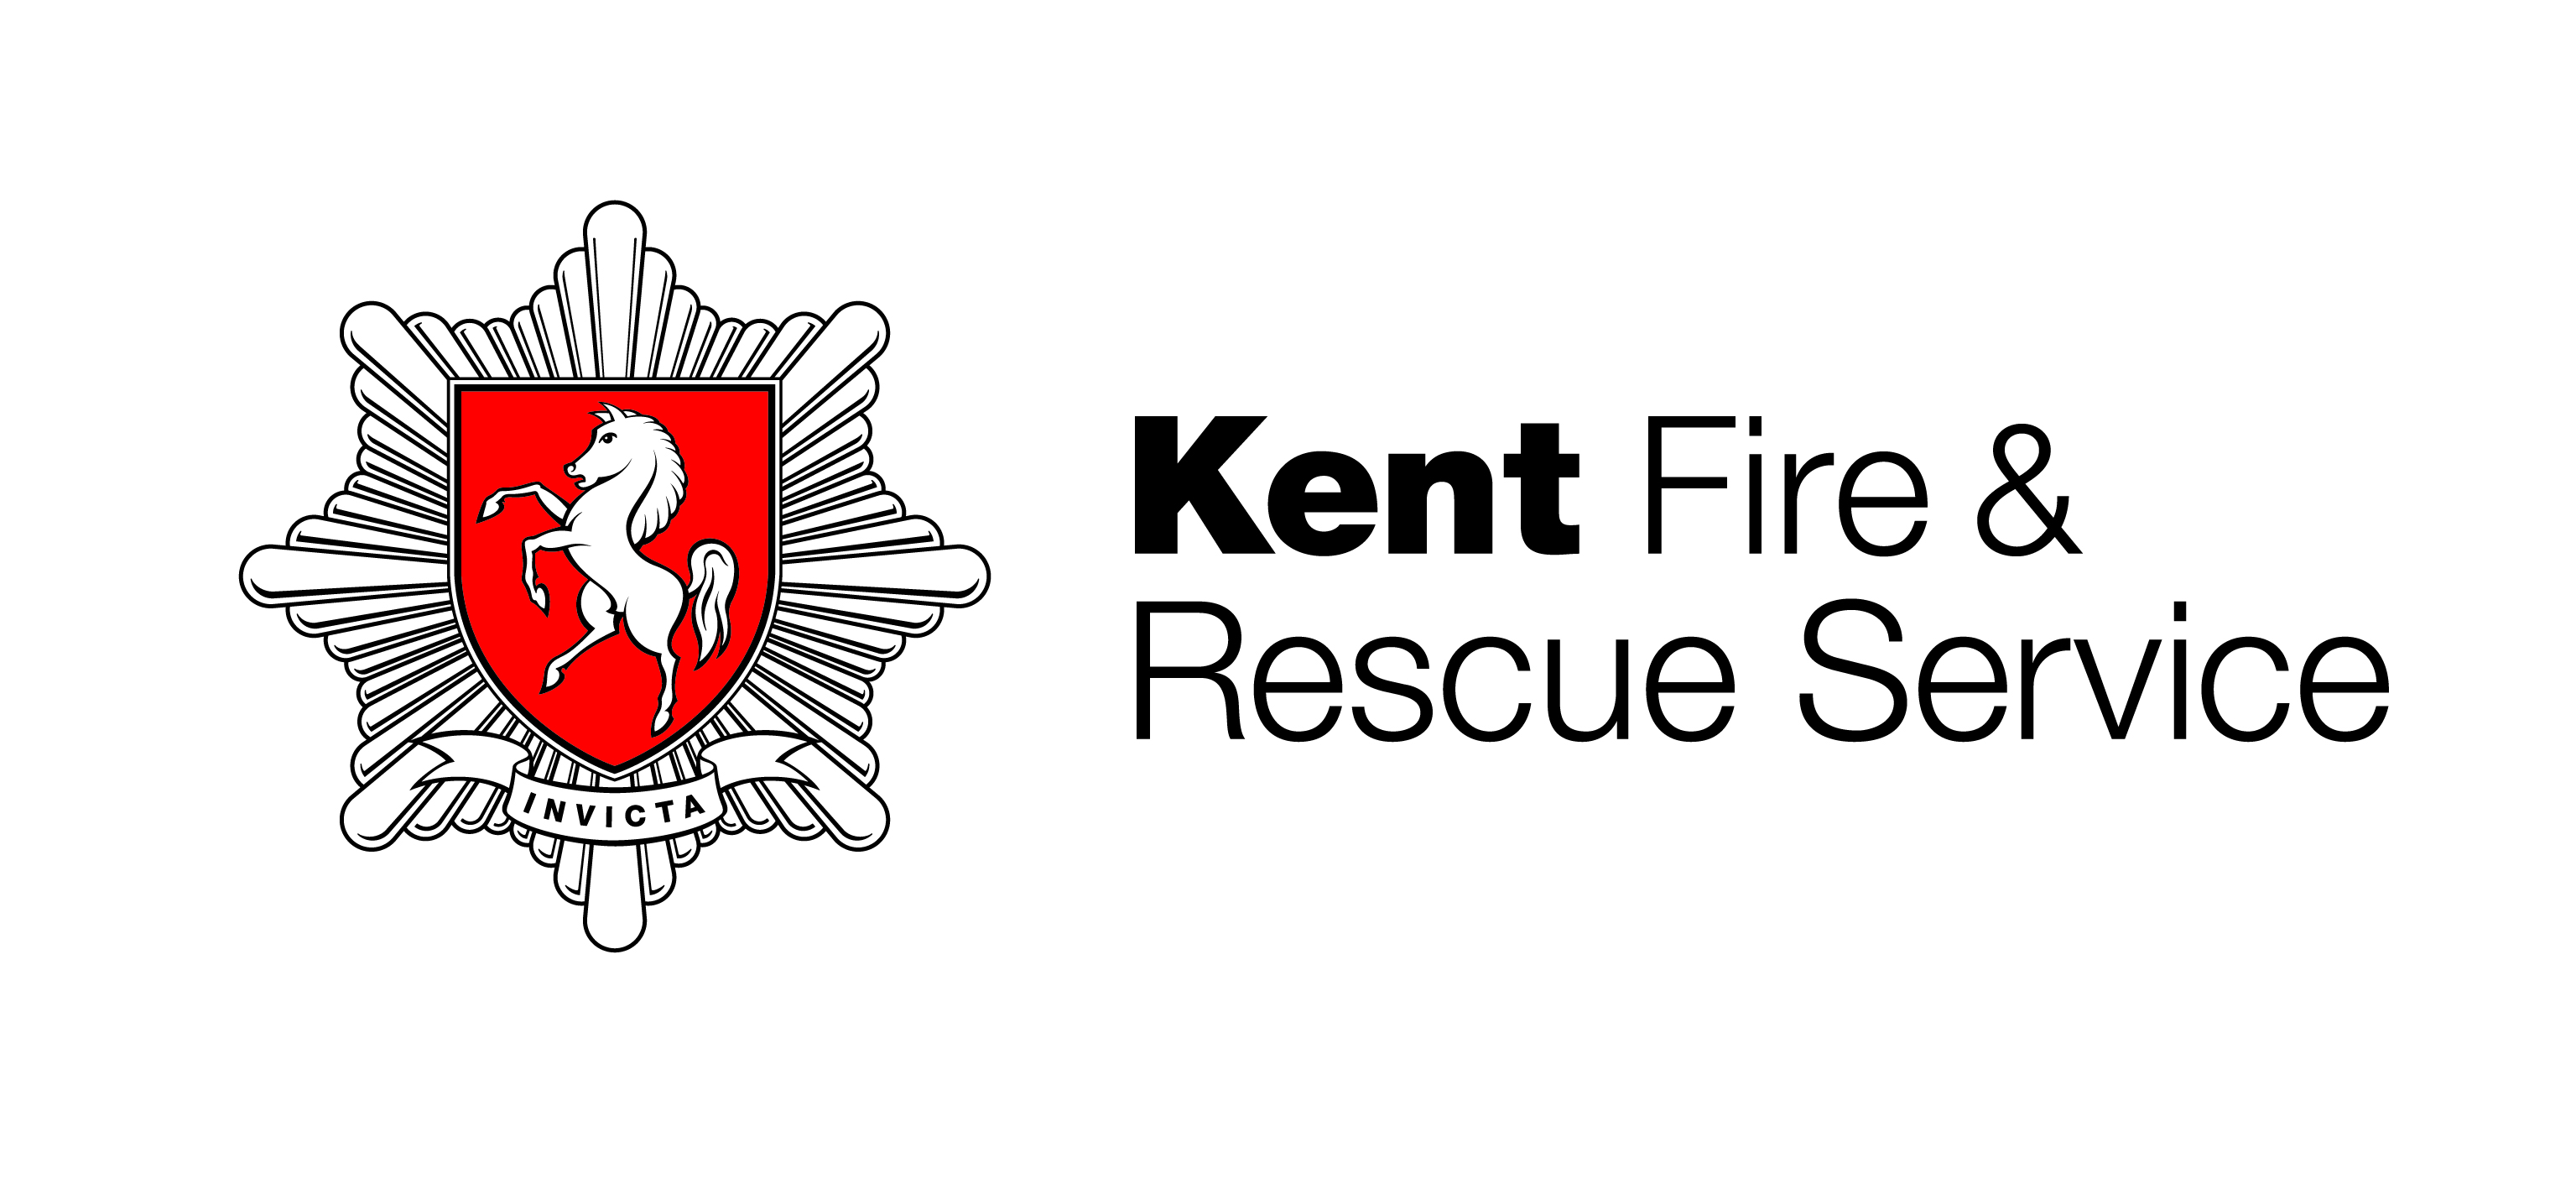 Kent Fire & Rescue Service